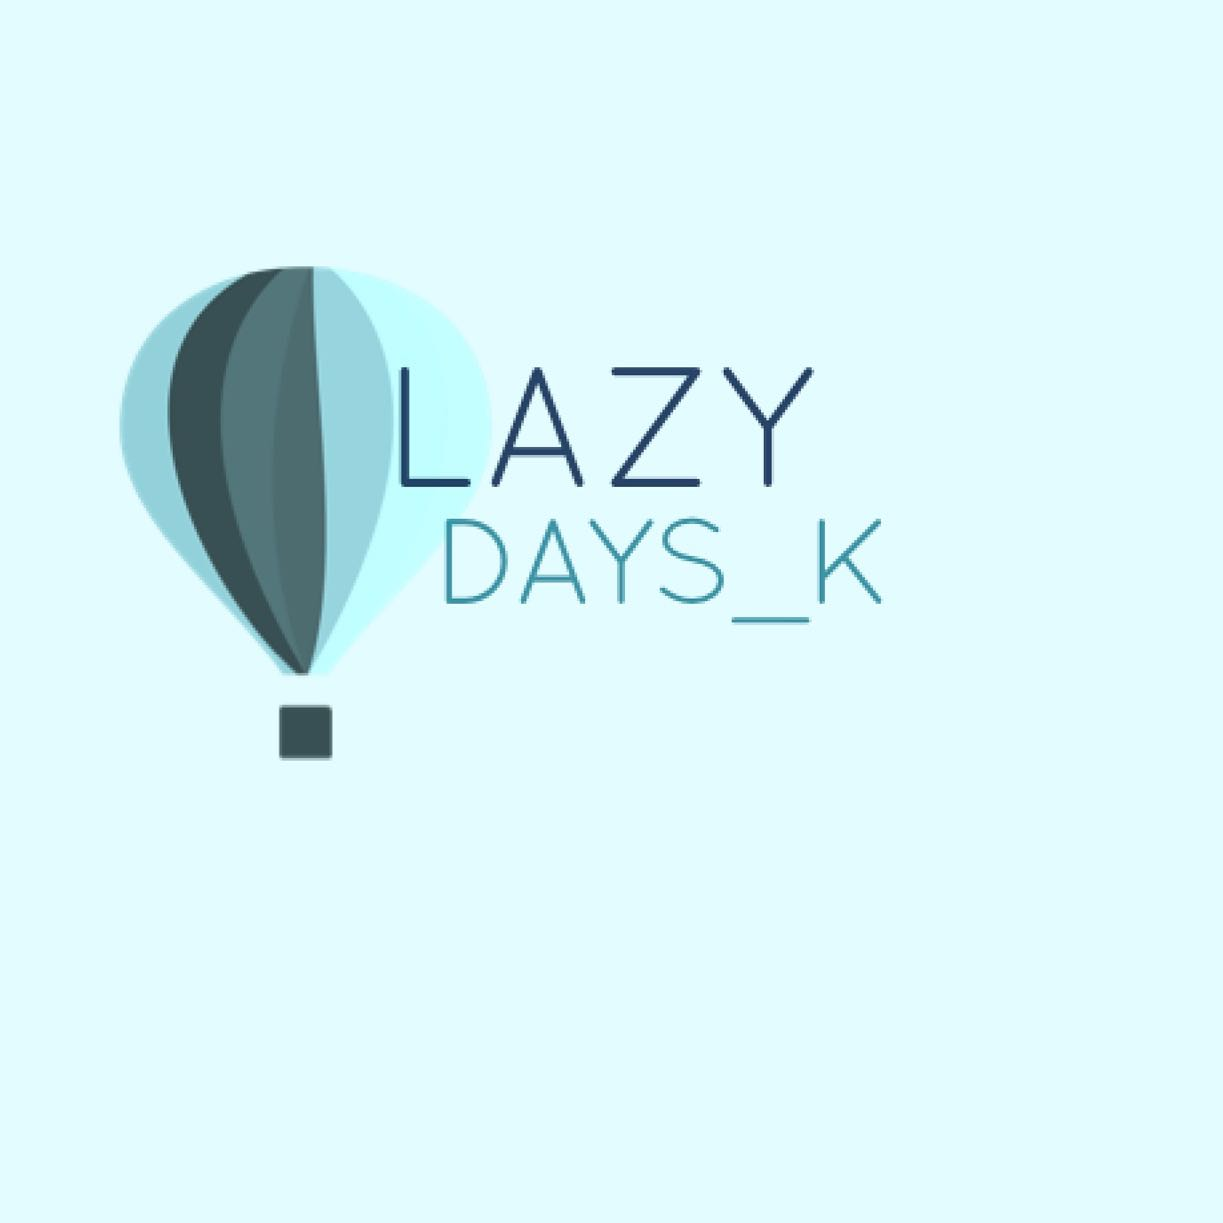 lazydays_k